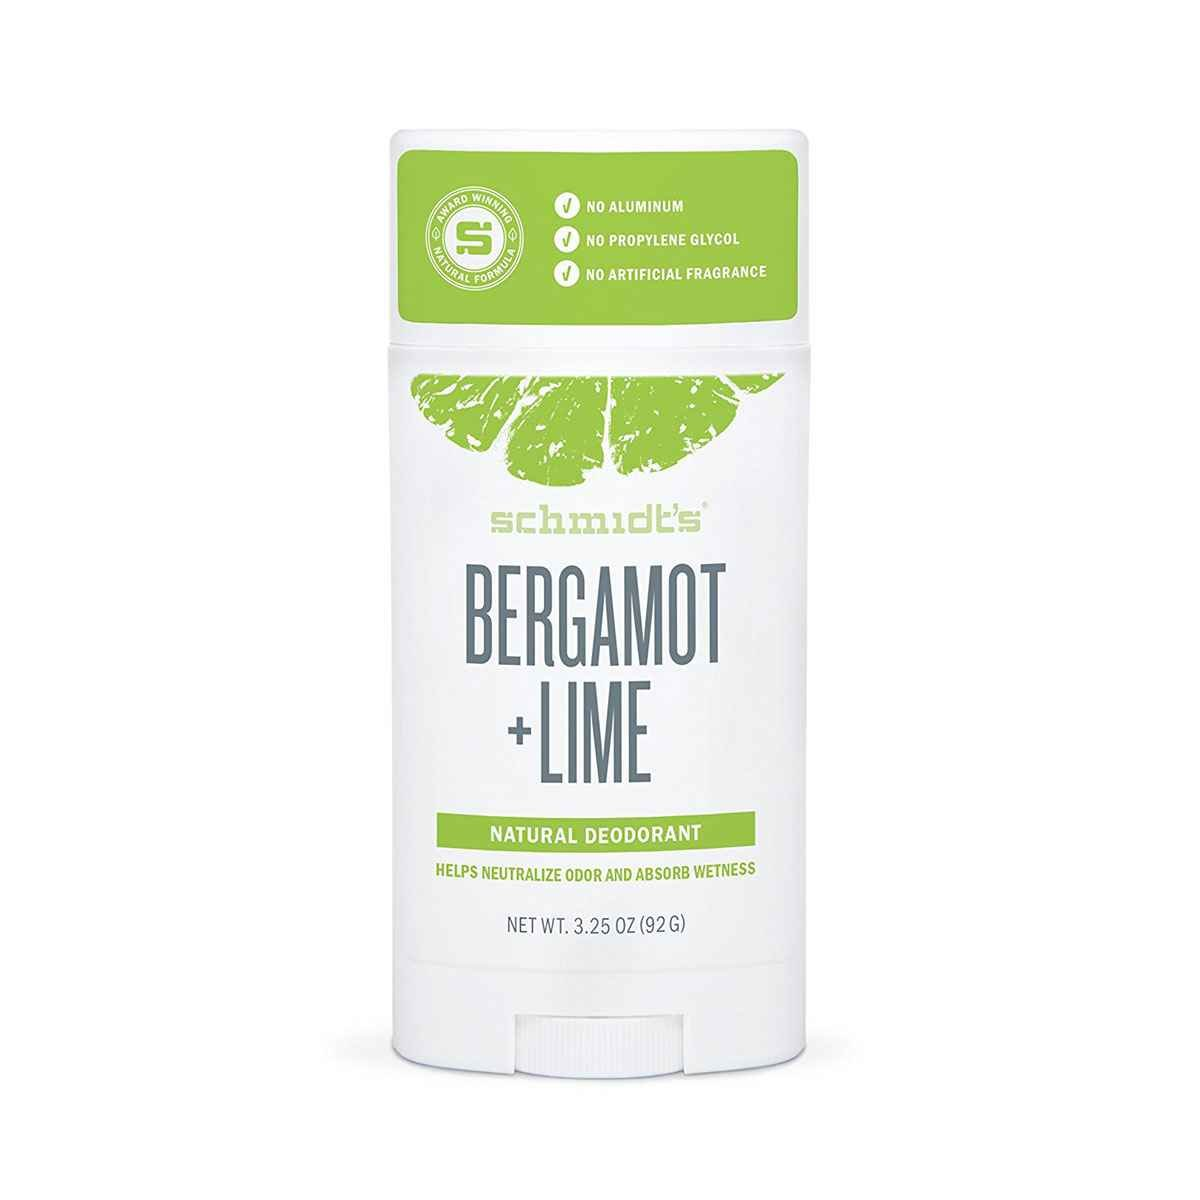 Schmidt - Desodorante Bergamota + Lime, 3,25 OZ (92g) Schmidt's Deodorant 019962085017